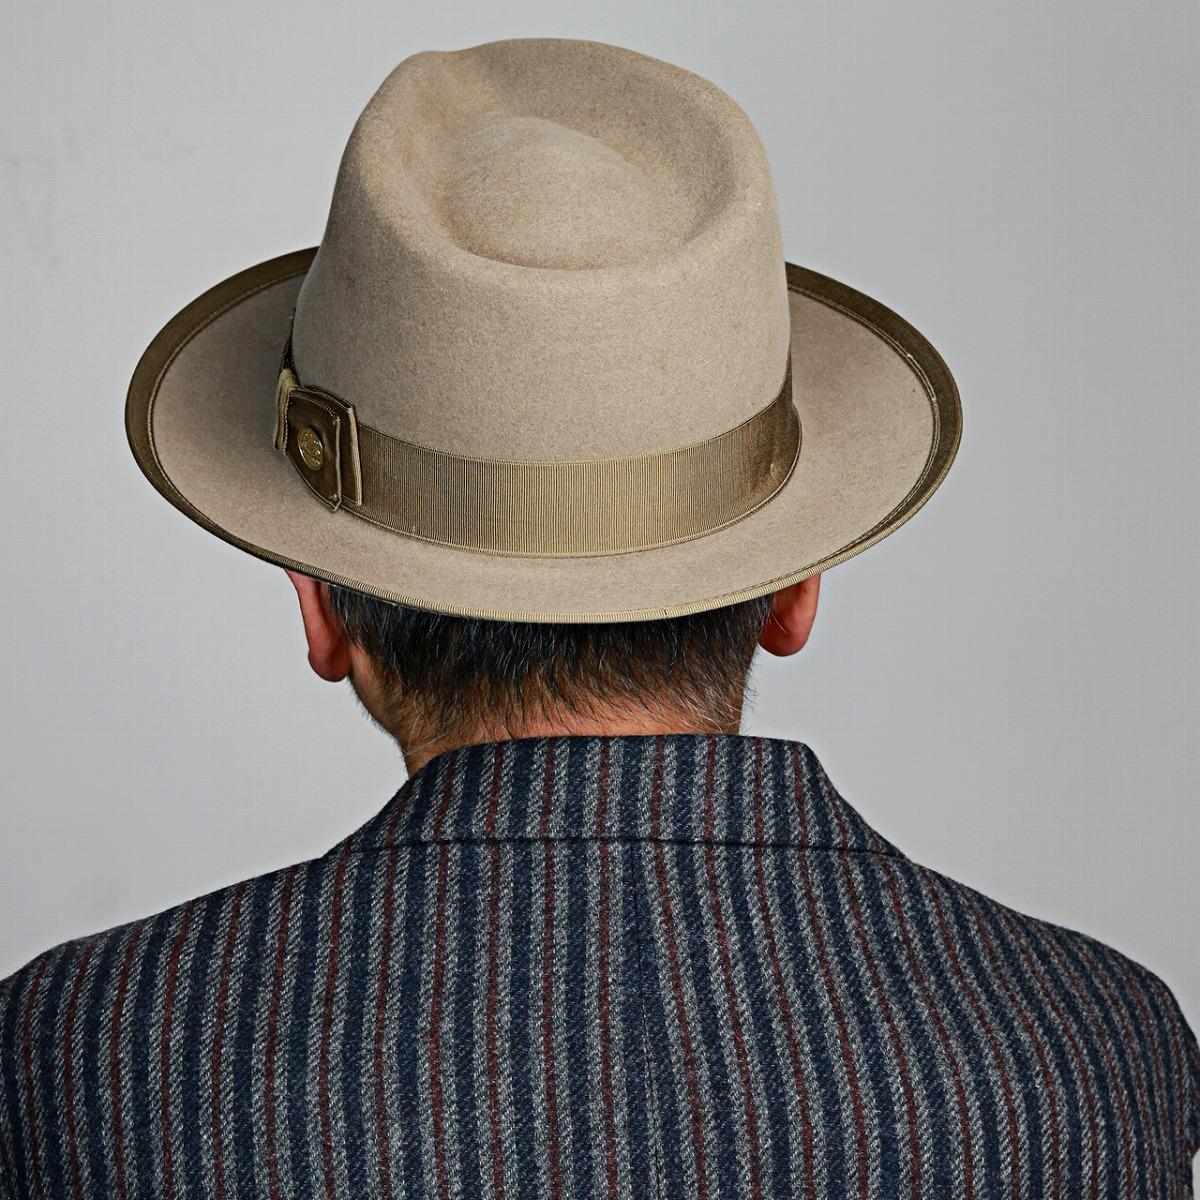 9d9adce58431 ... Ver.2 beaver rabbit Stetson vintage we pet piping soft felt hat high  quality hat